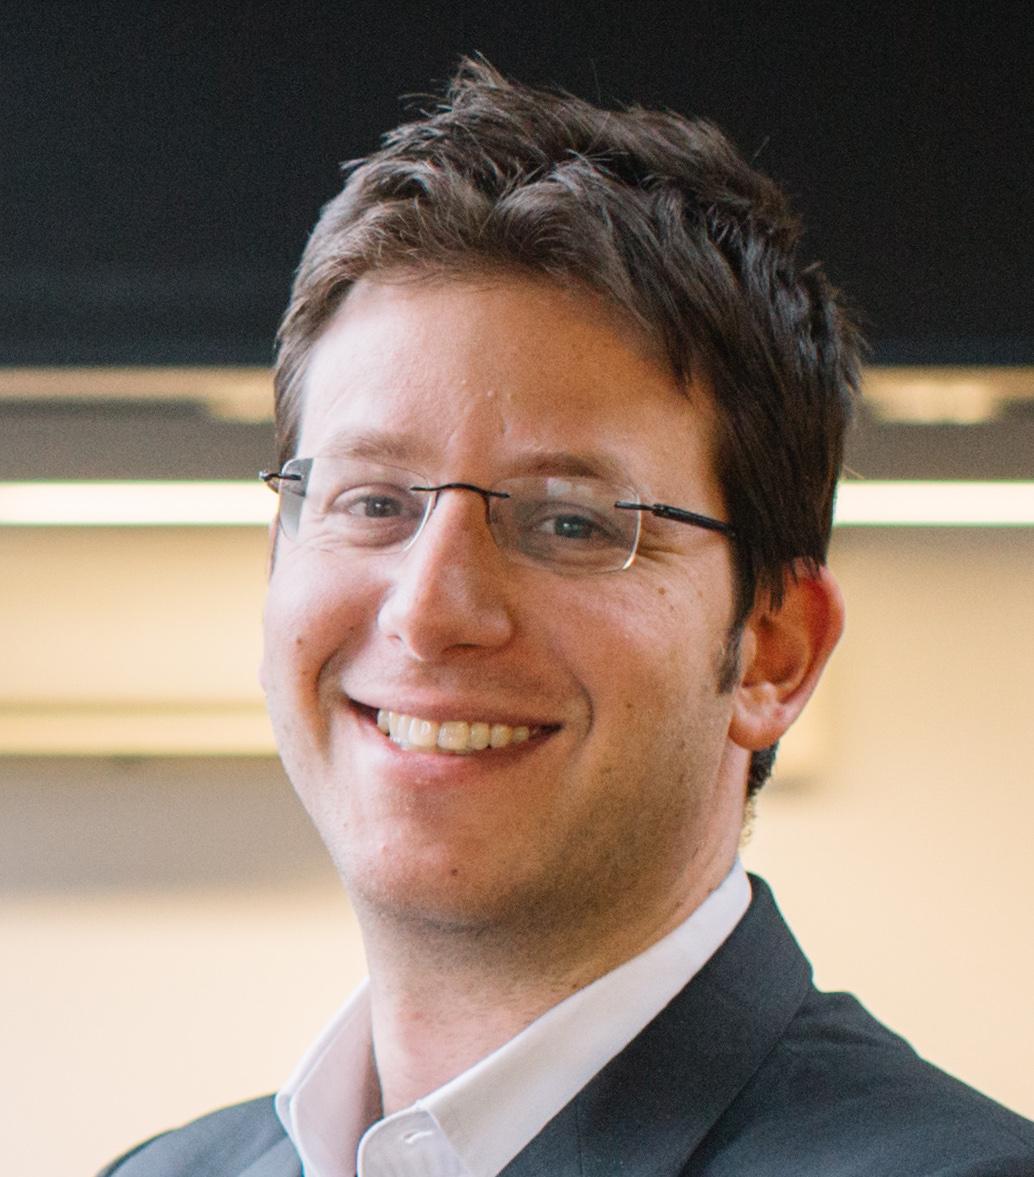 Francis Barel, DG Paypal France, en juillet 2020